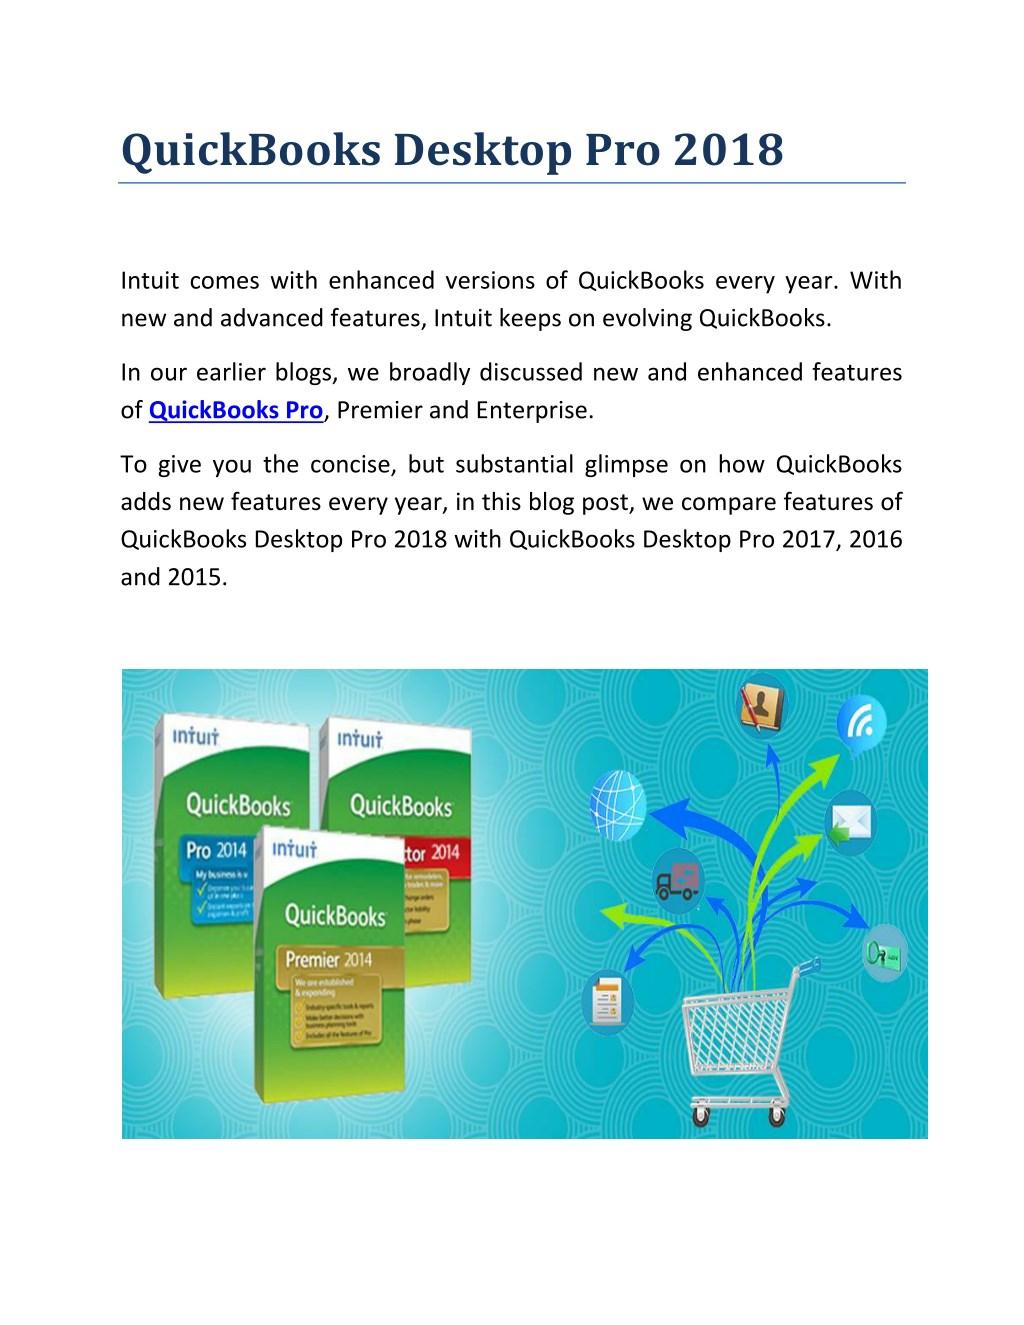 Ppt Quickbooks Desktop Pro 2018 Powerpoint Presentation Id 7725255